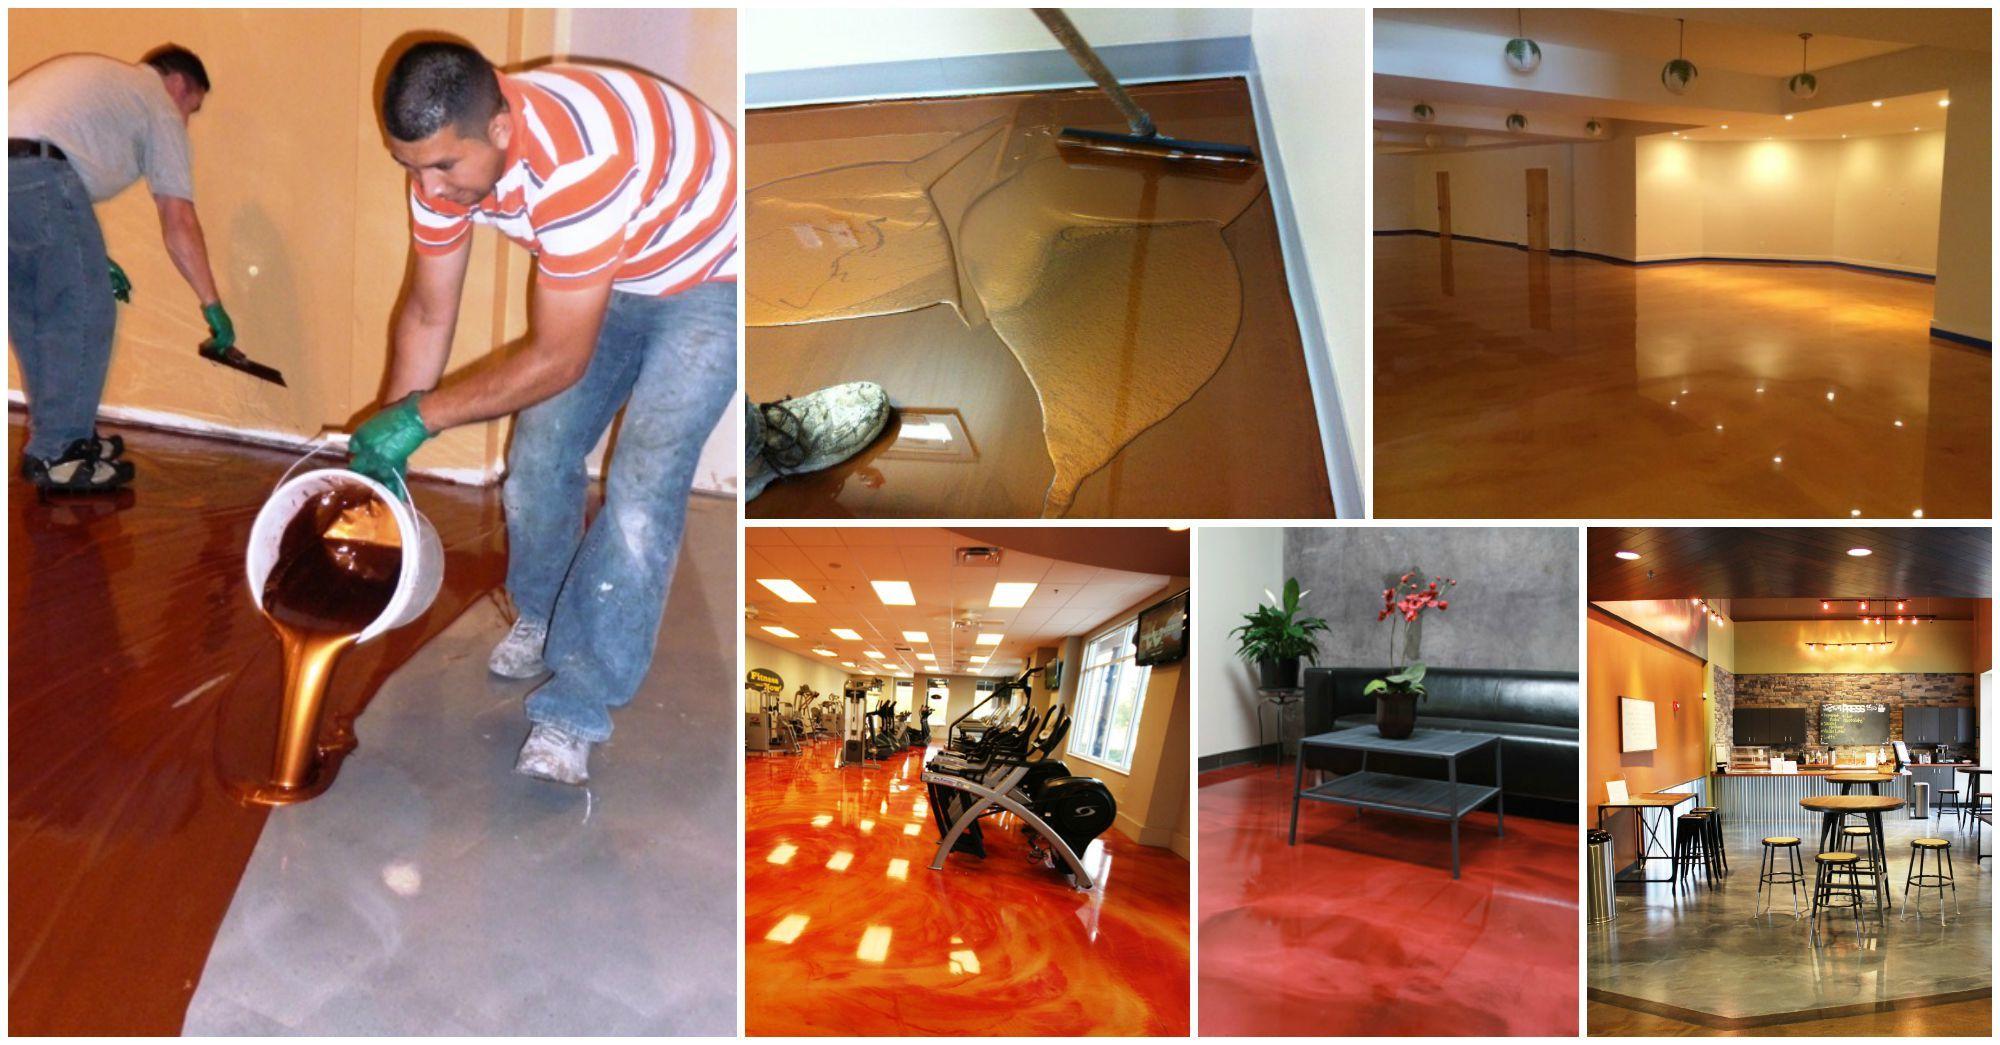 How Do They Do It? The Secret of Applying Metallic Epoxy Flooring